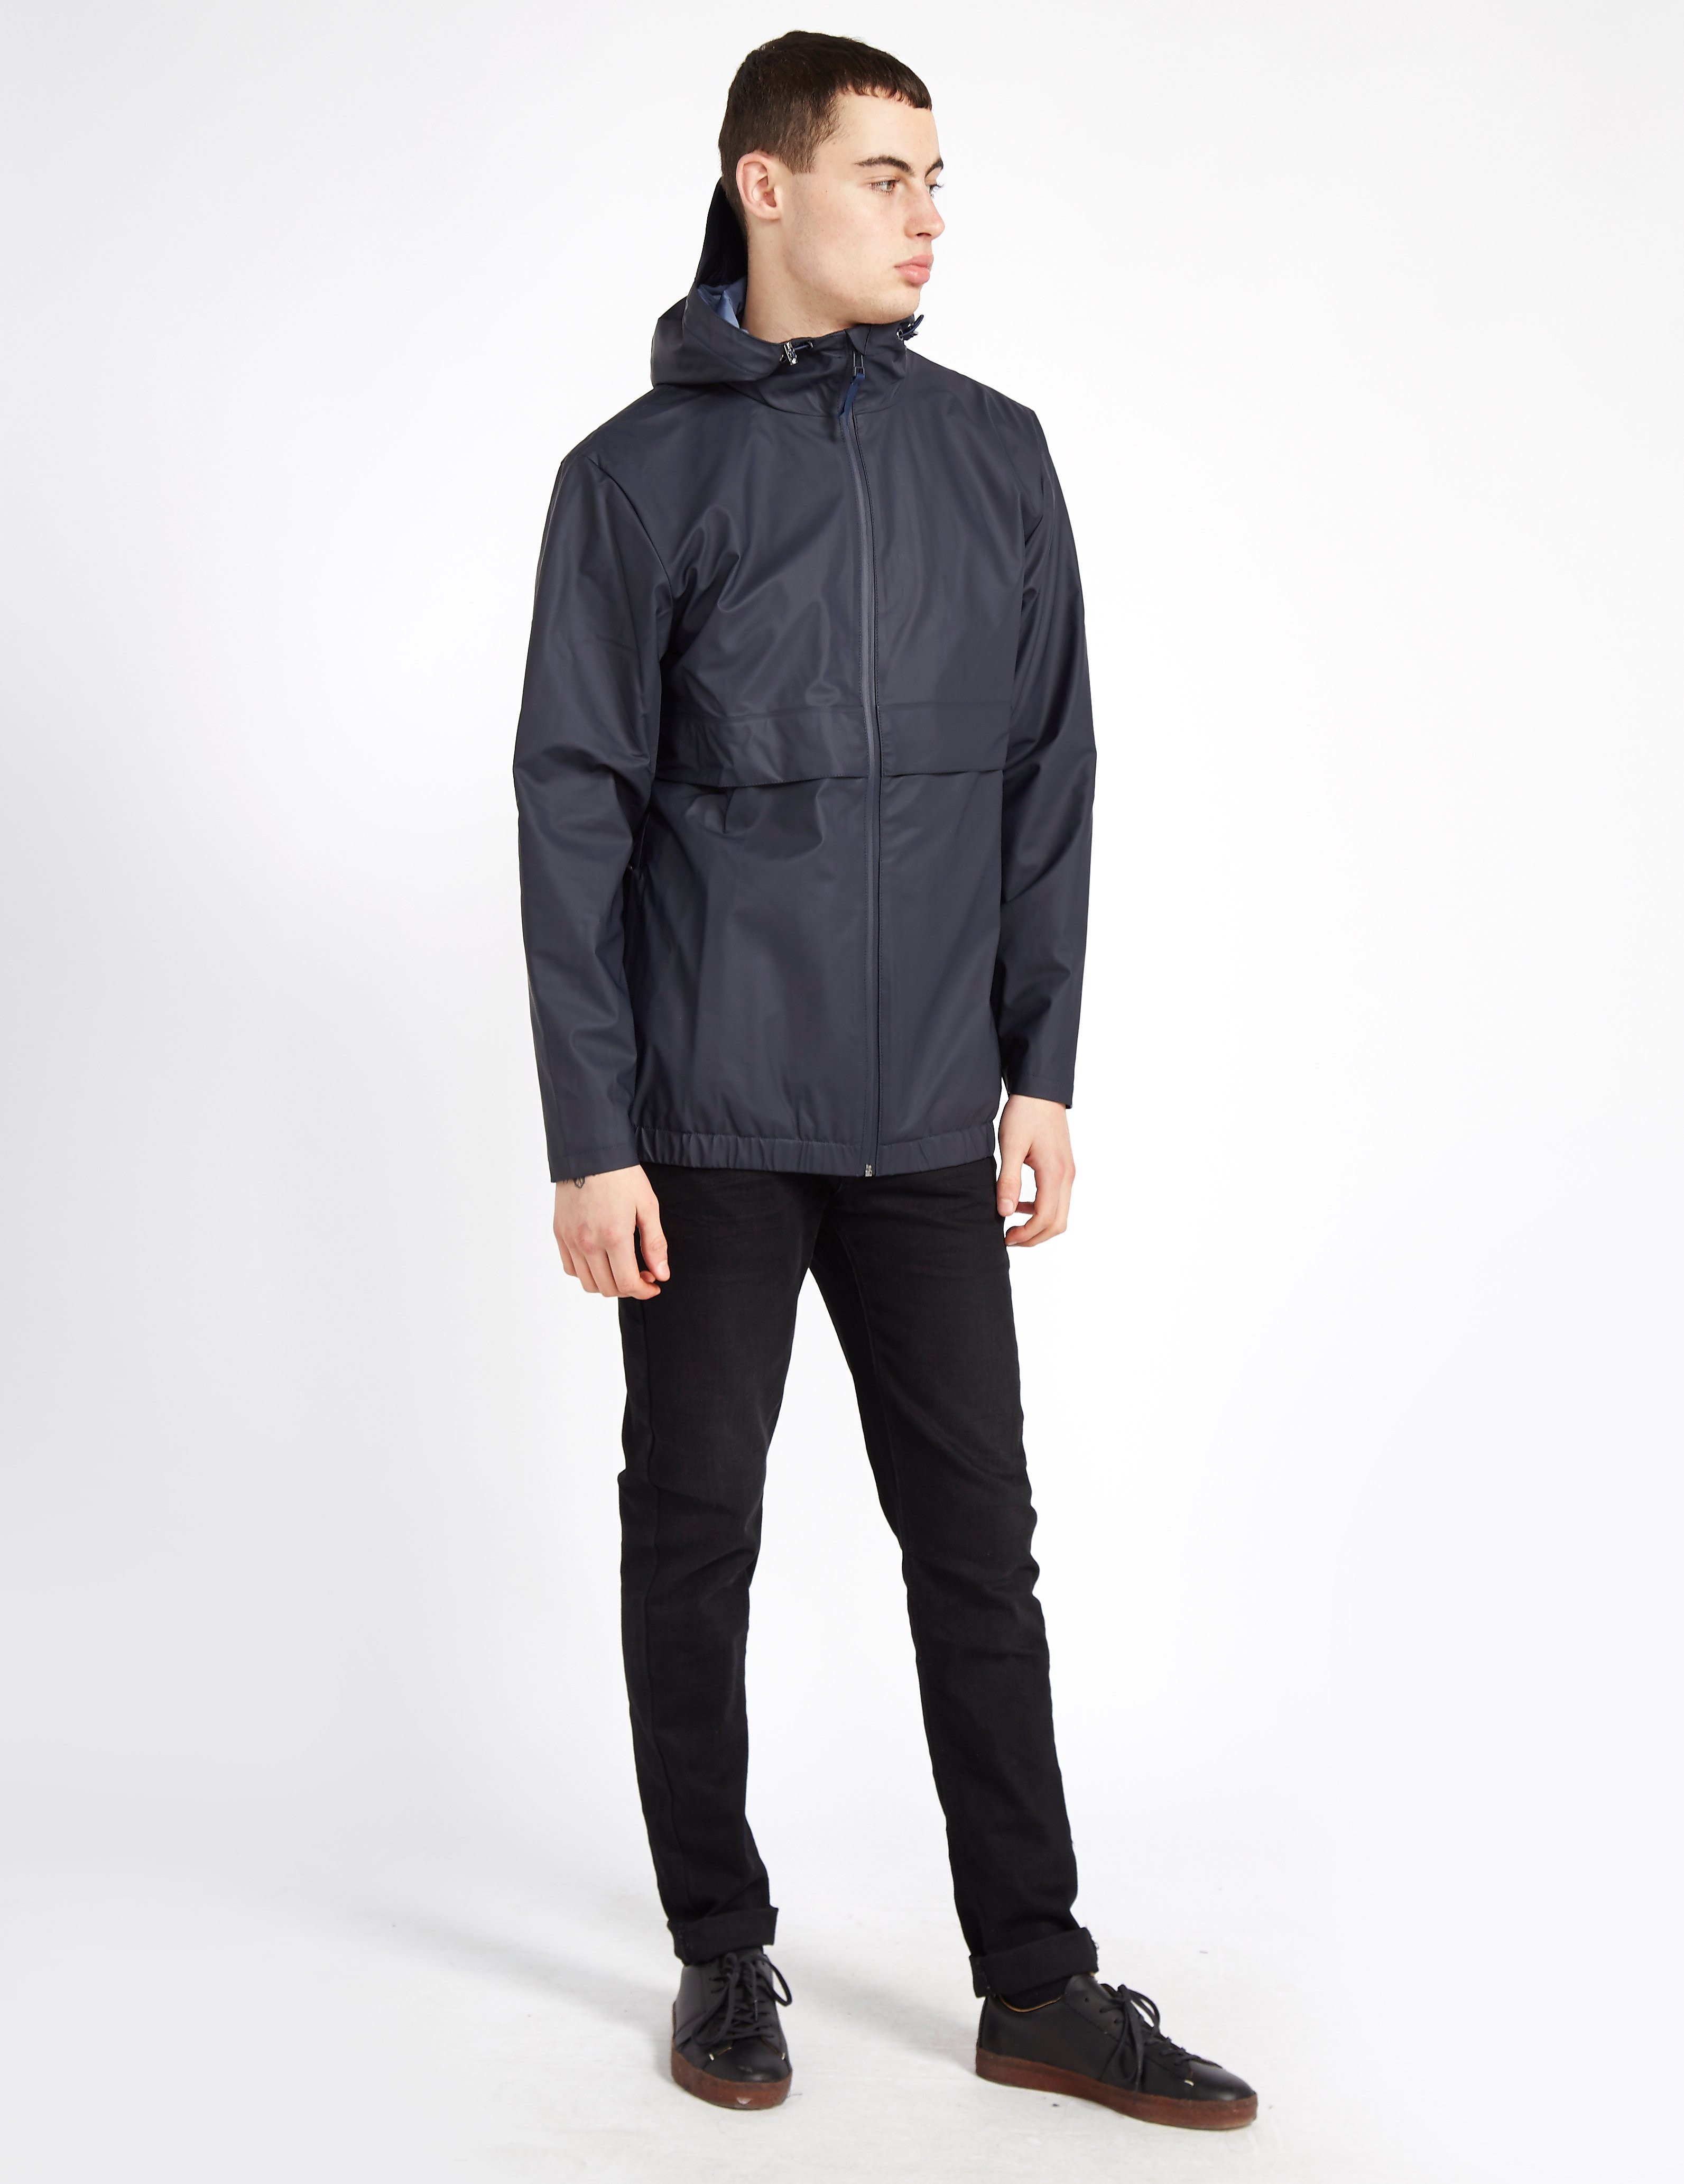 RAINS Free Jacket